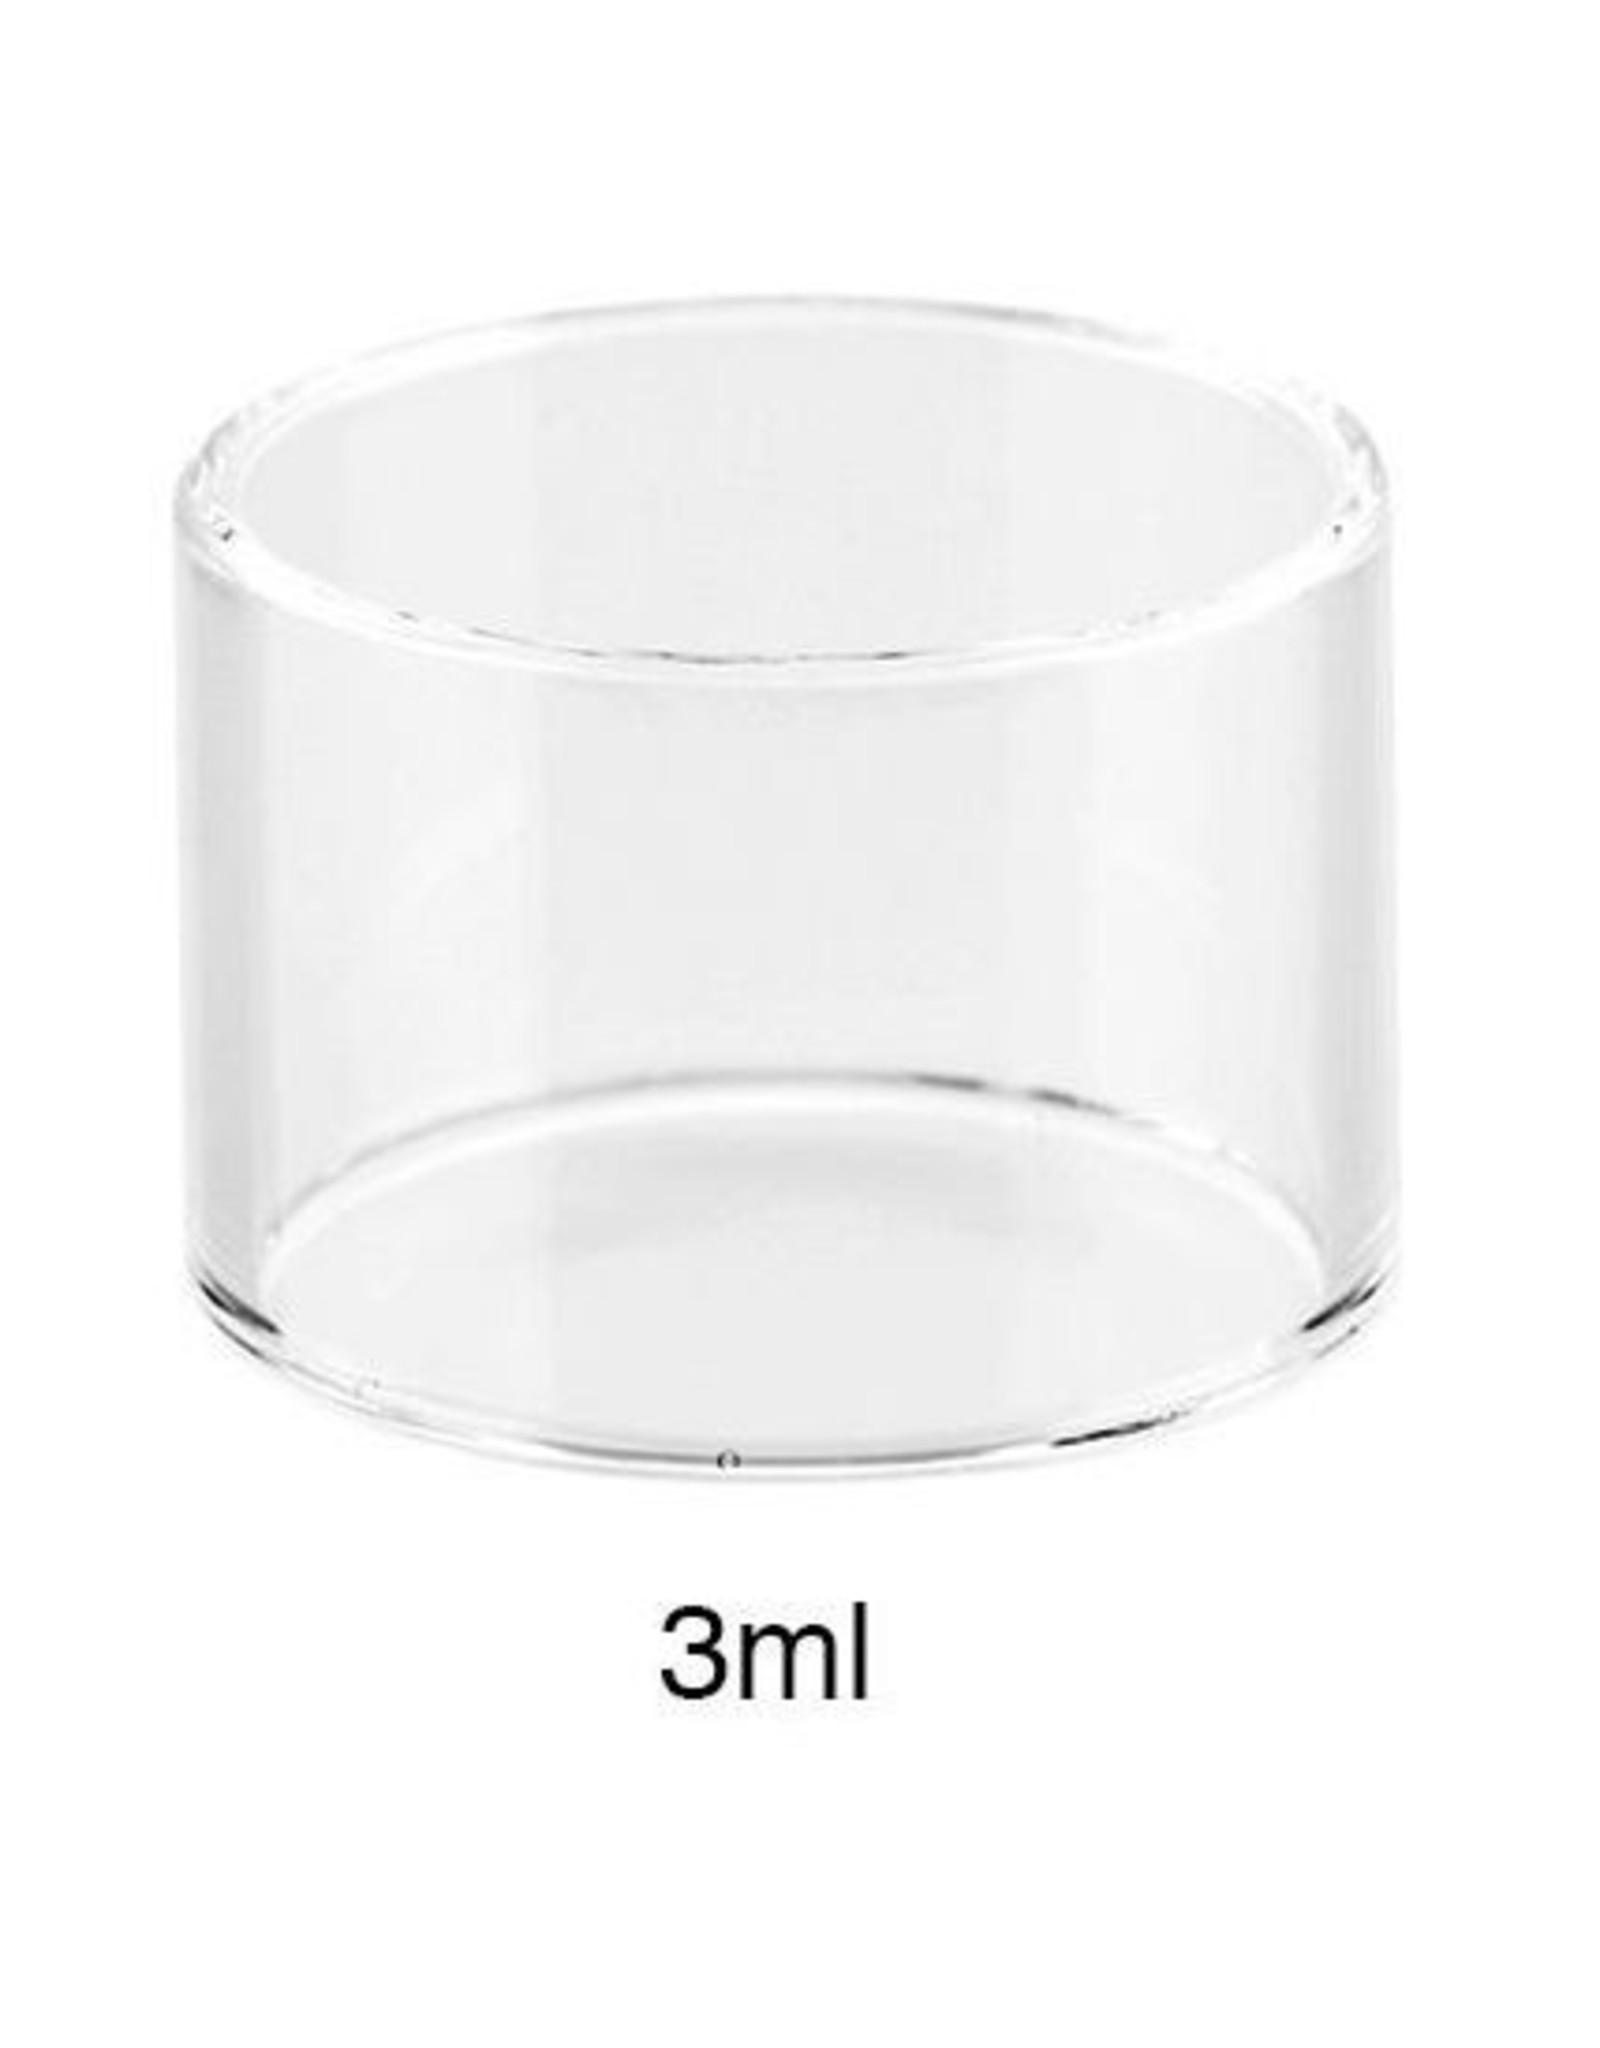 Aspire Aspire Cleito 120 PRO Replacement Glass 3.0 ml